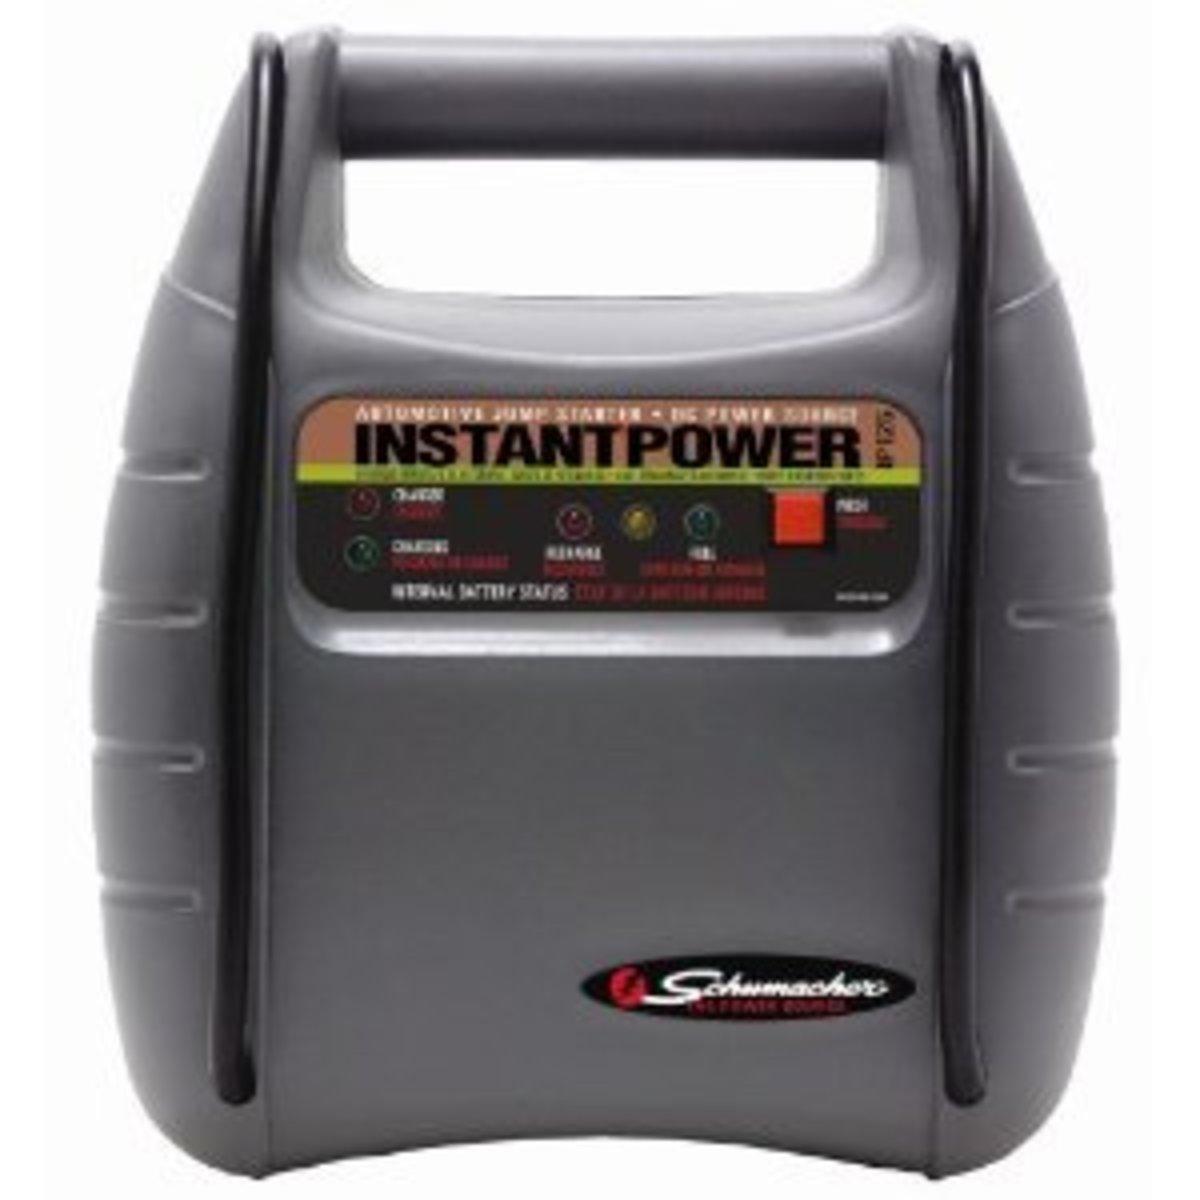 Schumacher IP-125 Instant Power Jump Starter With 12 Amp Hour Battery